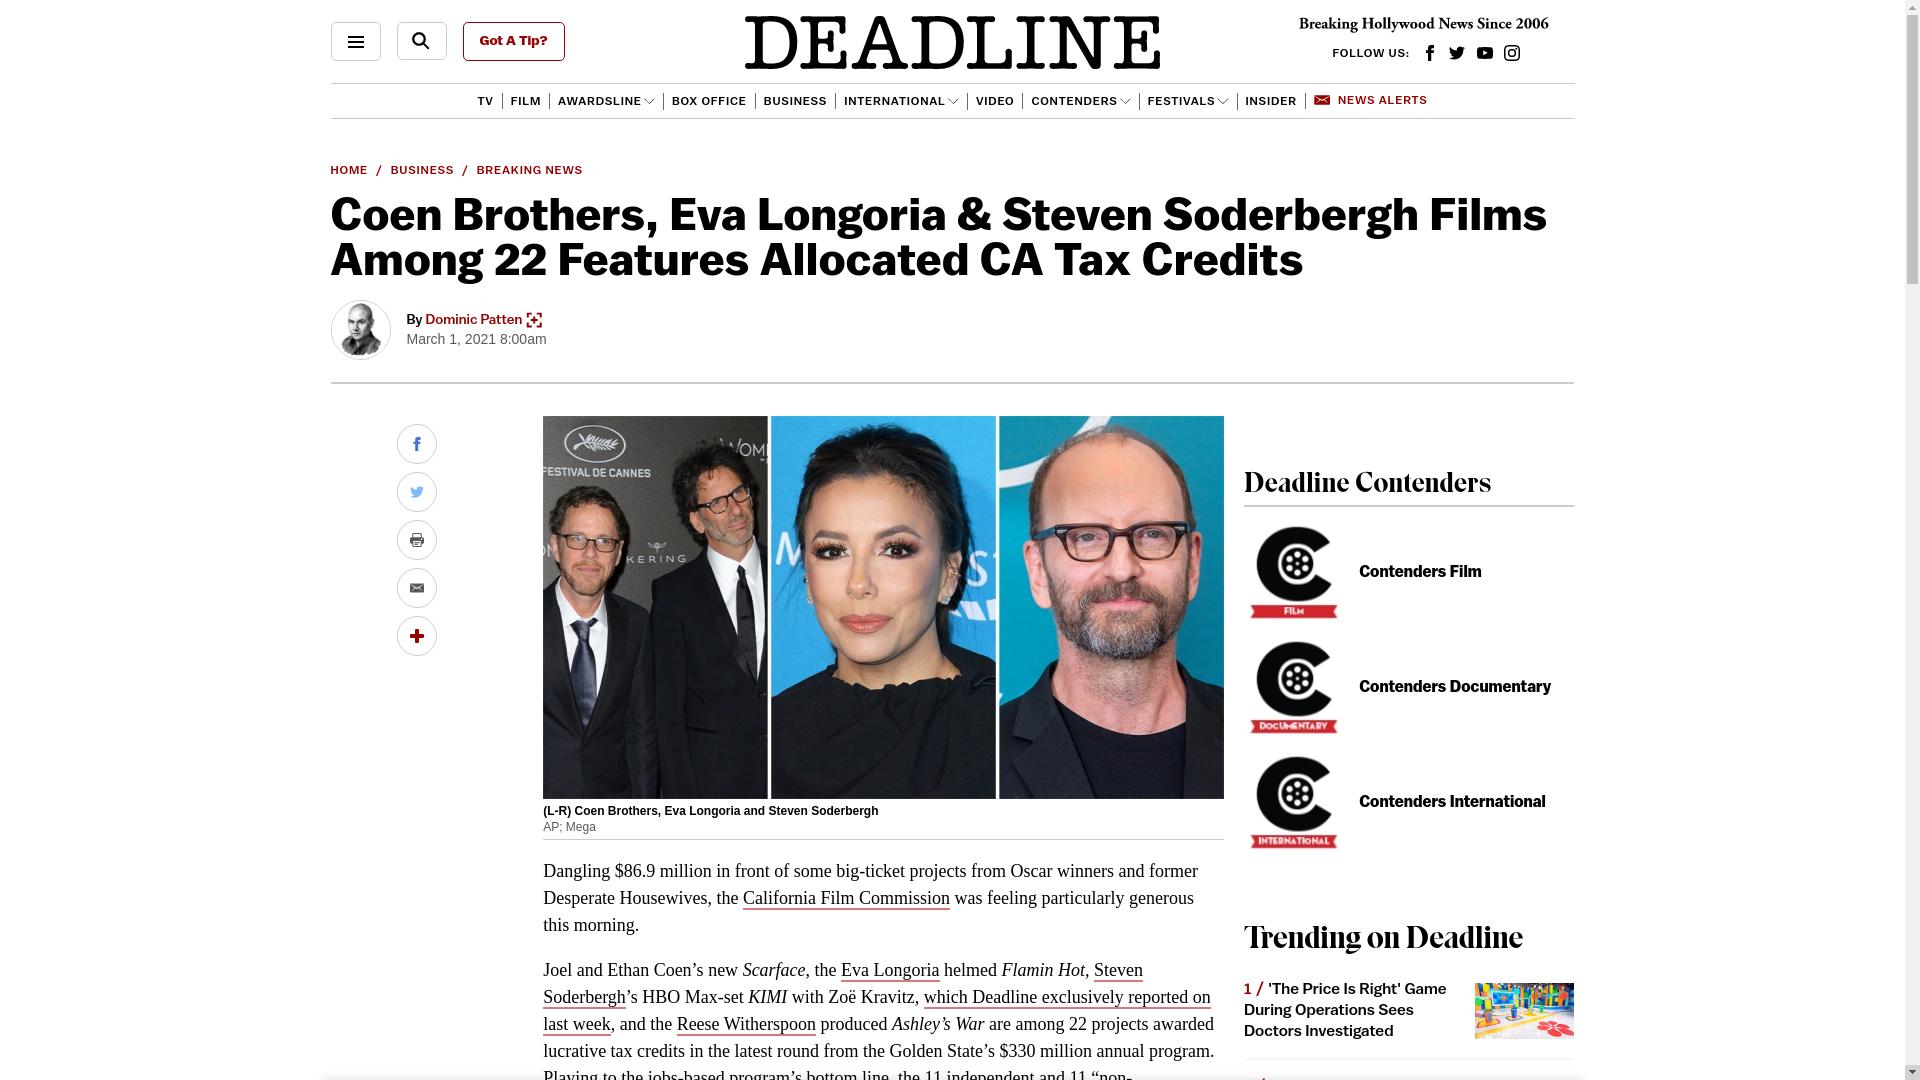 Fairness Rocks News Coen Brothers, Eva Longoria & Steven Soderbergh Films Among 22 Features Allocated CA Tax Credits